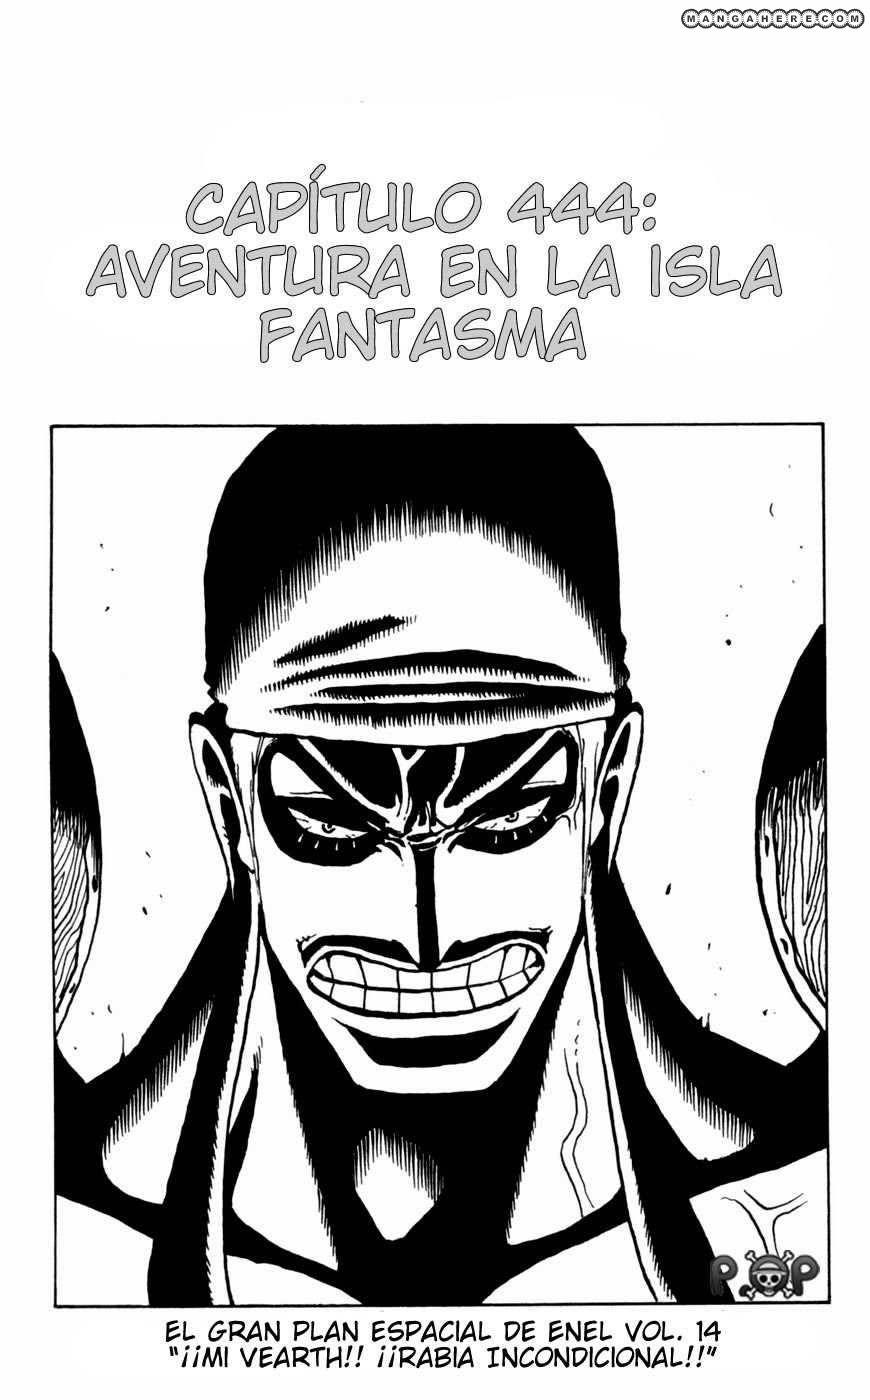 https://c5.ninemanga.com/es_manga/50/114/309734/96483b00ce708a926f9657f27569c812.jpg Page 1